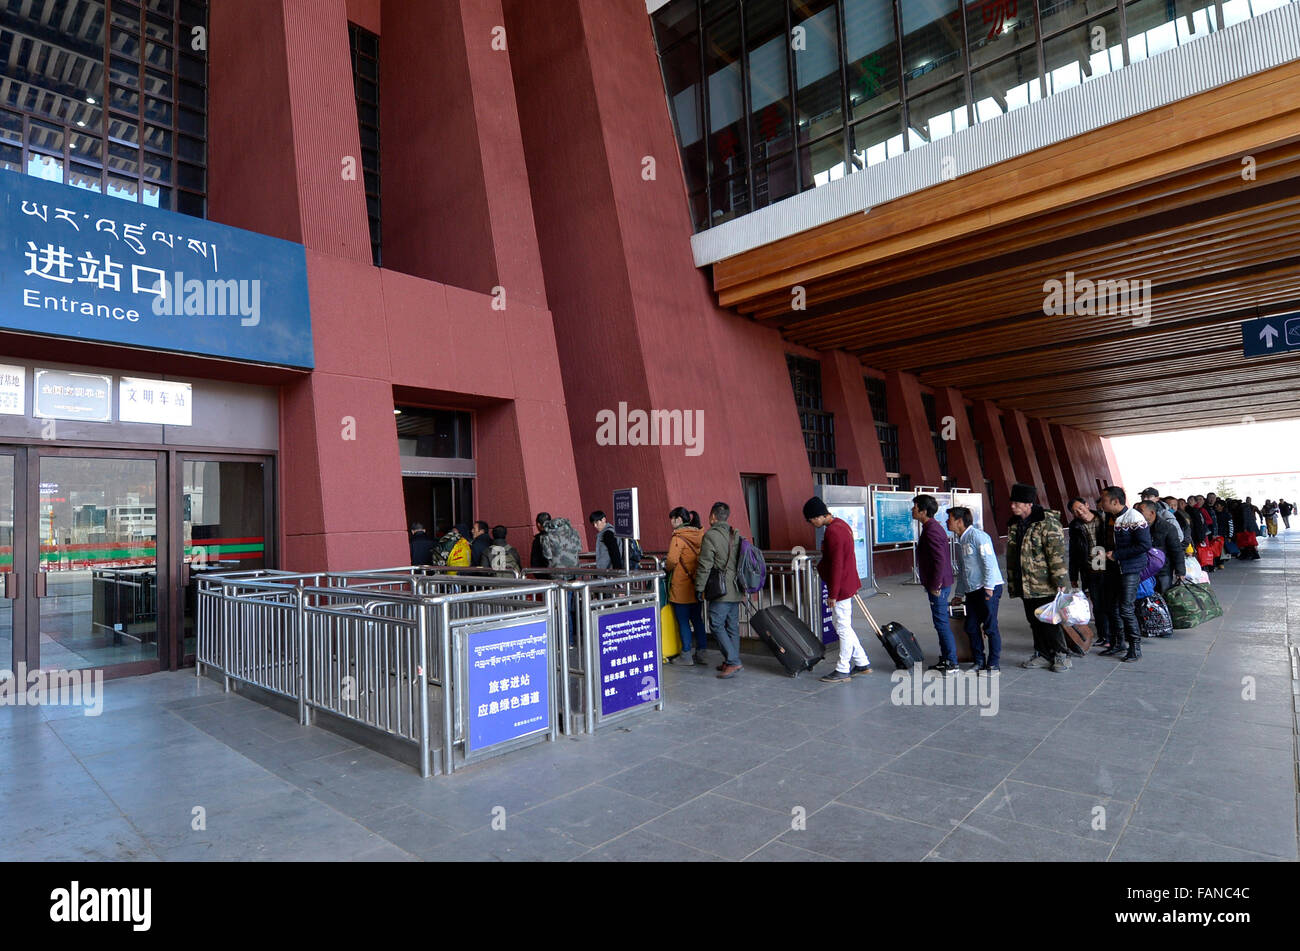 Lhasa, China's Tibet Autonomous Region. 2nd Jan, 2016. Passengers enter a train station in Lhasa, capital of - Stock Image